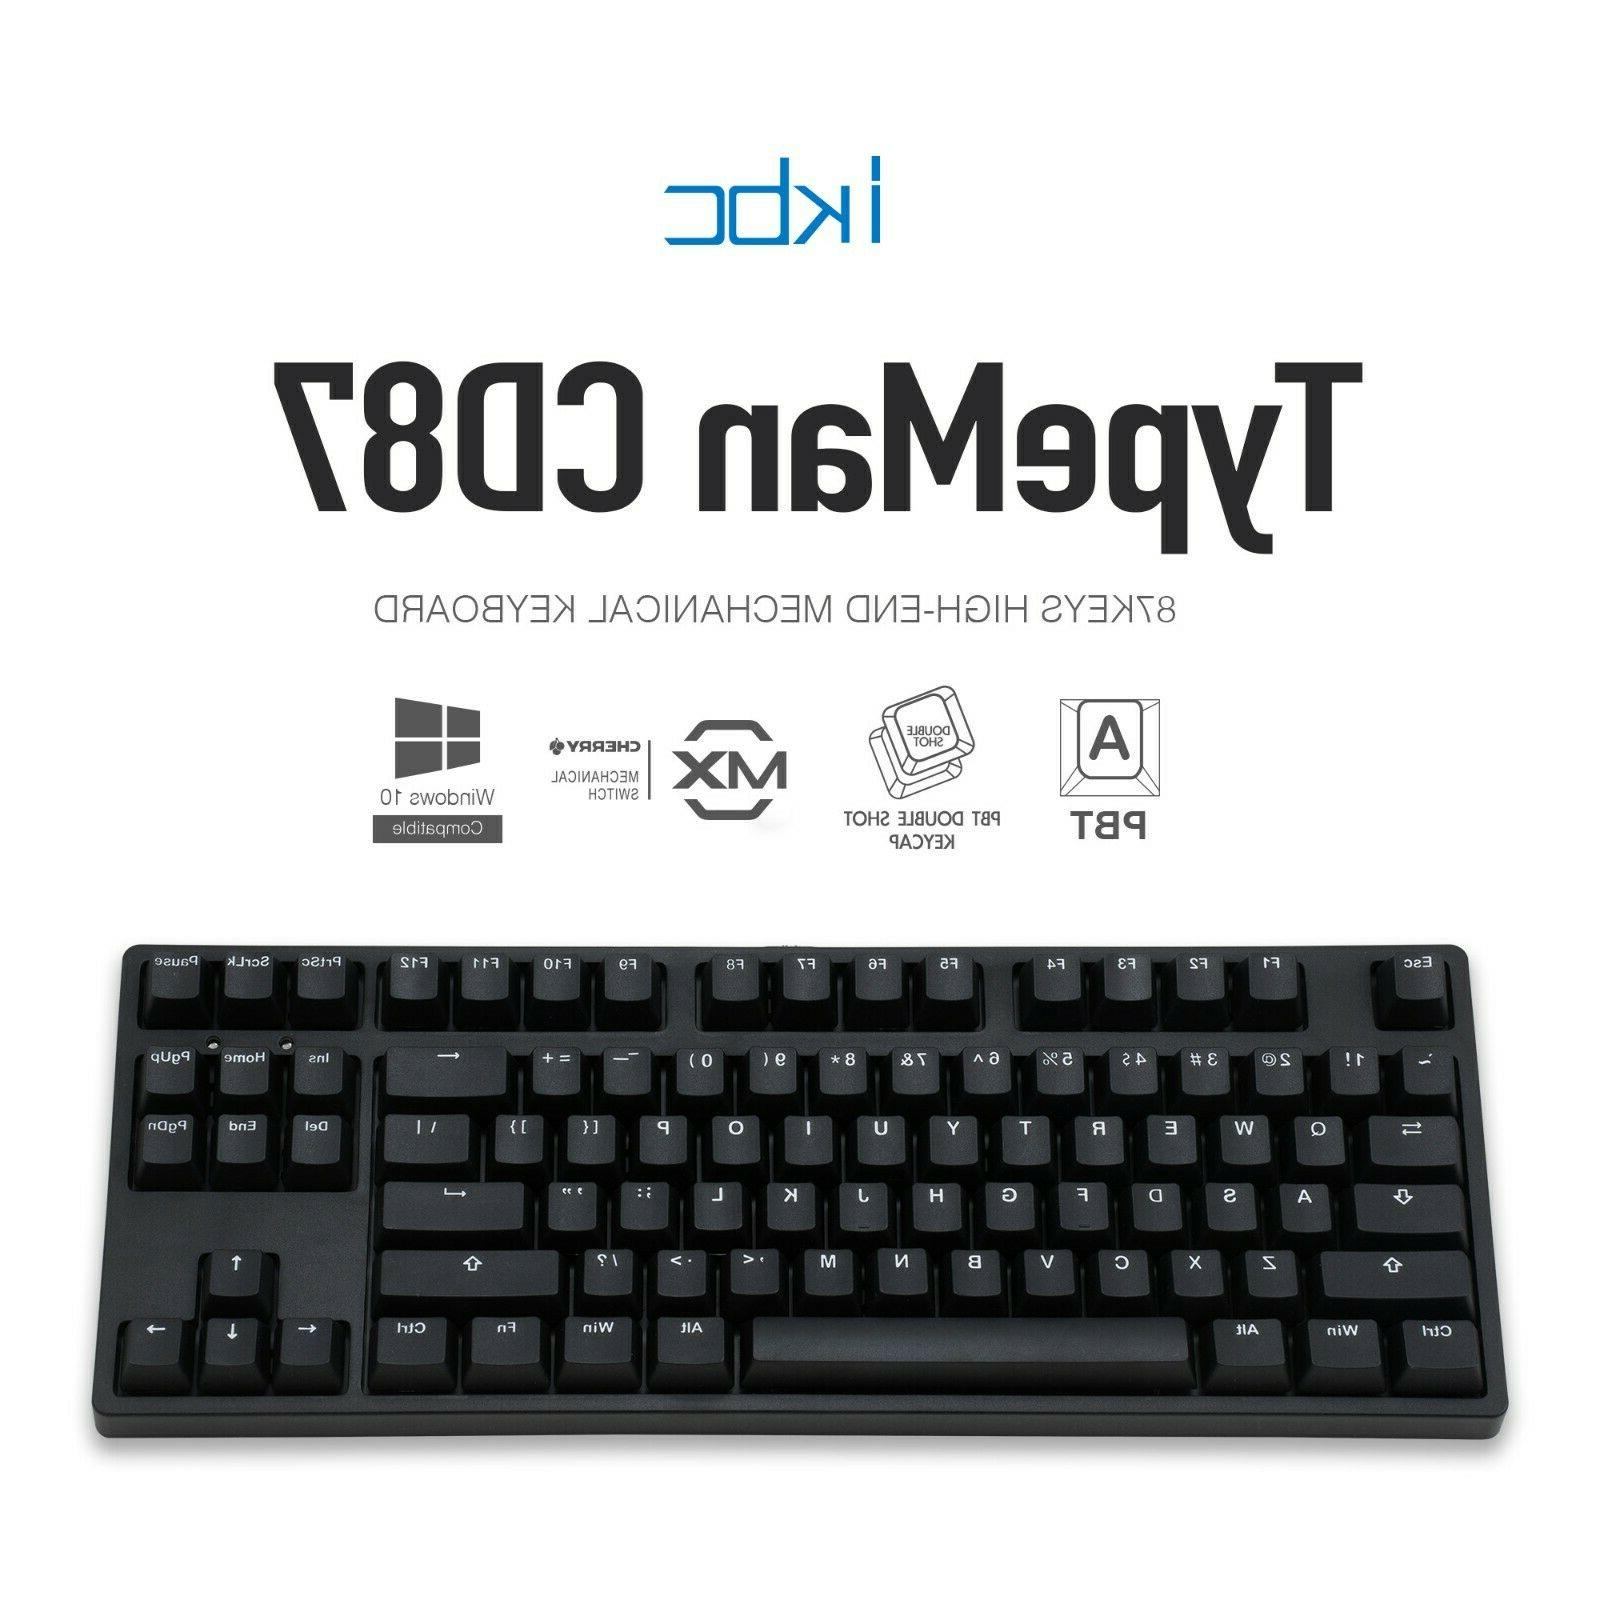 cd87 v2 mechanical ergonomic keyboard with cherry